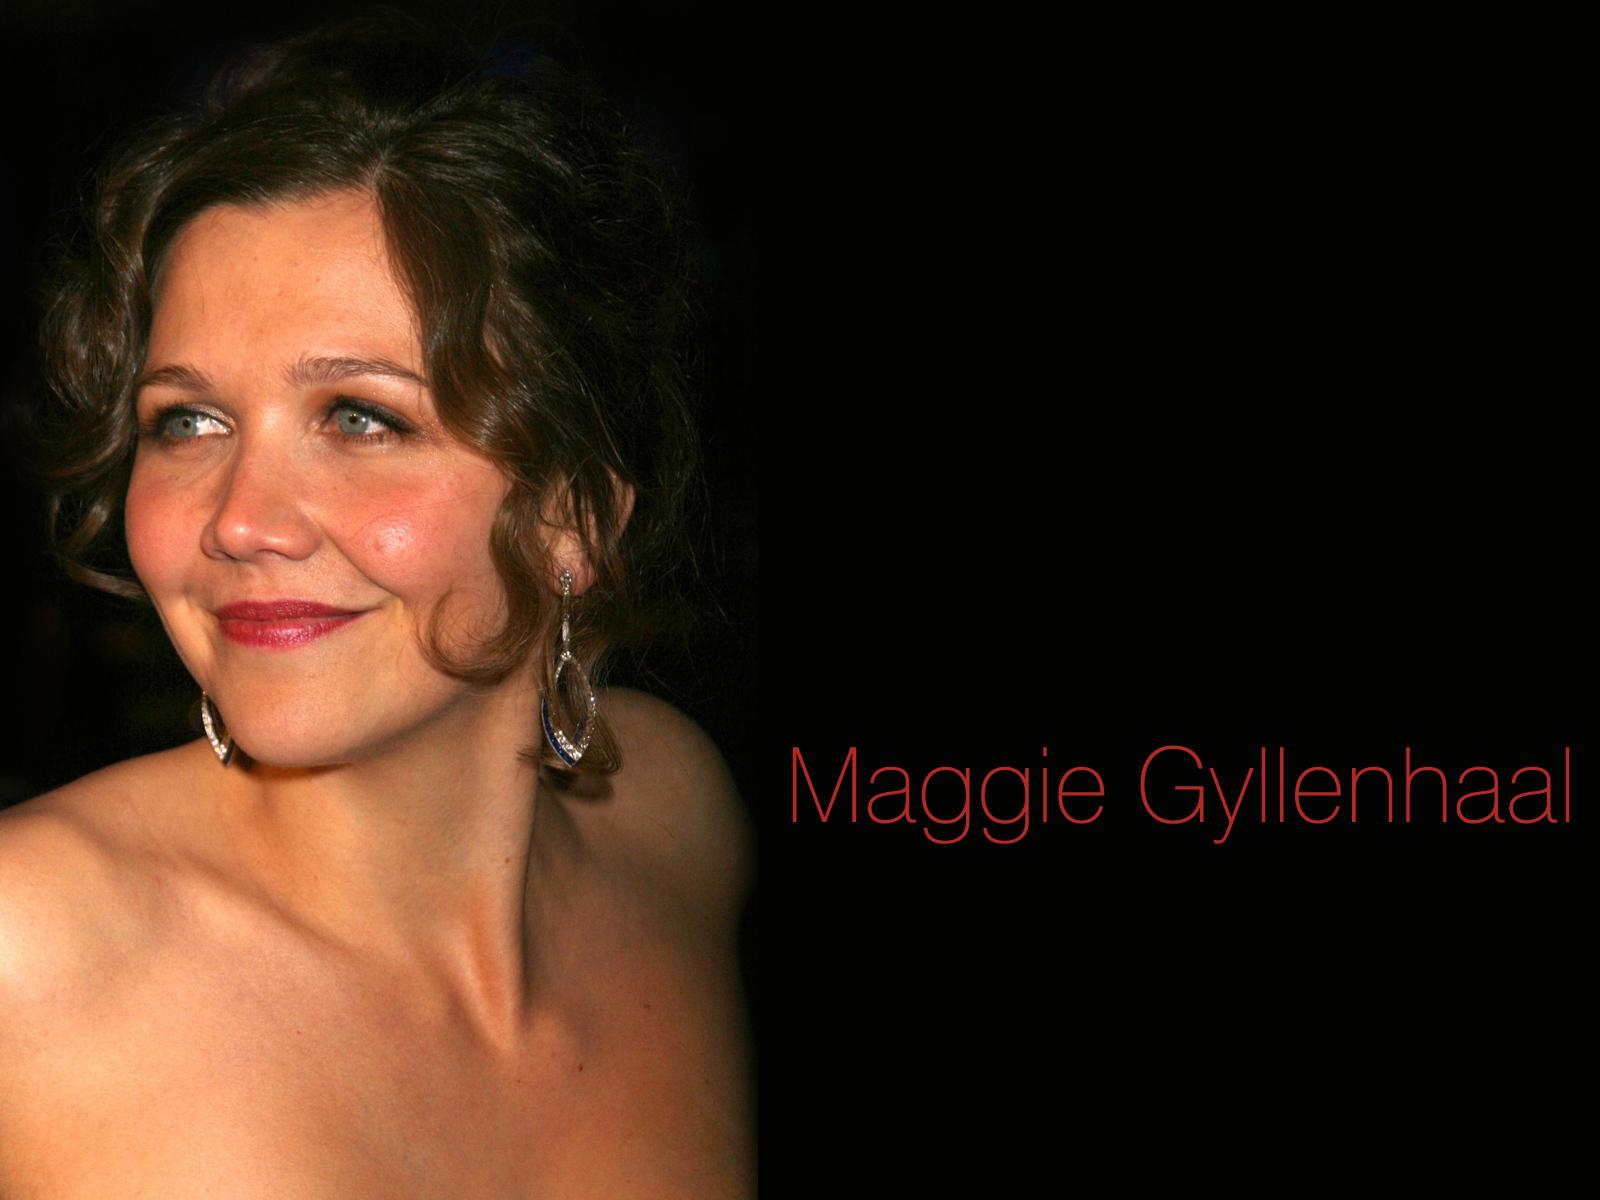 Maggie Gyllenhaal Quotes. QuotesGram Maggie Gyllenhaal